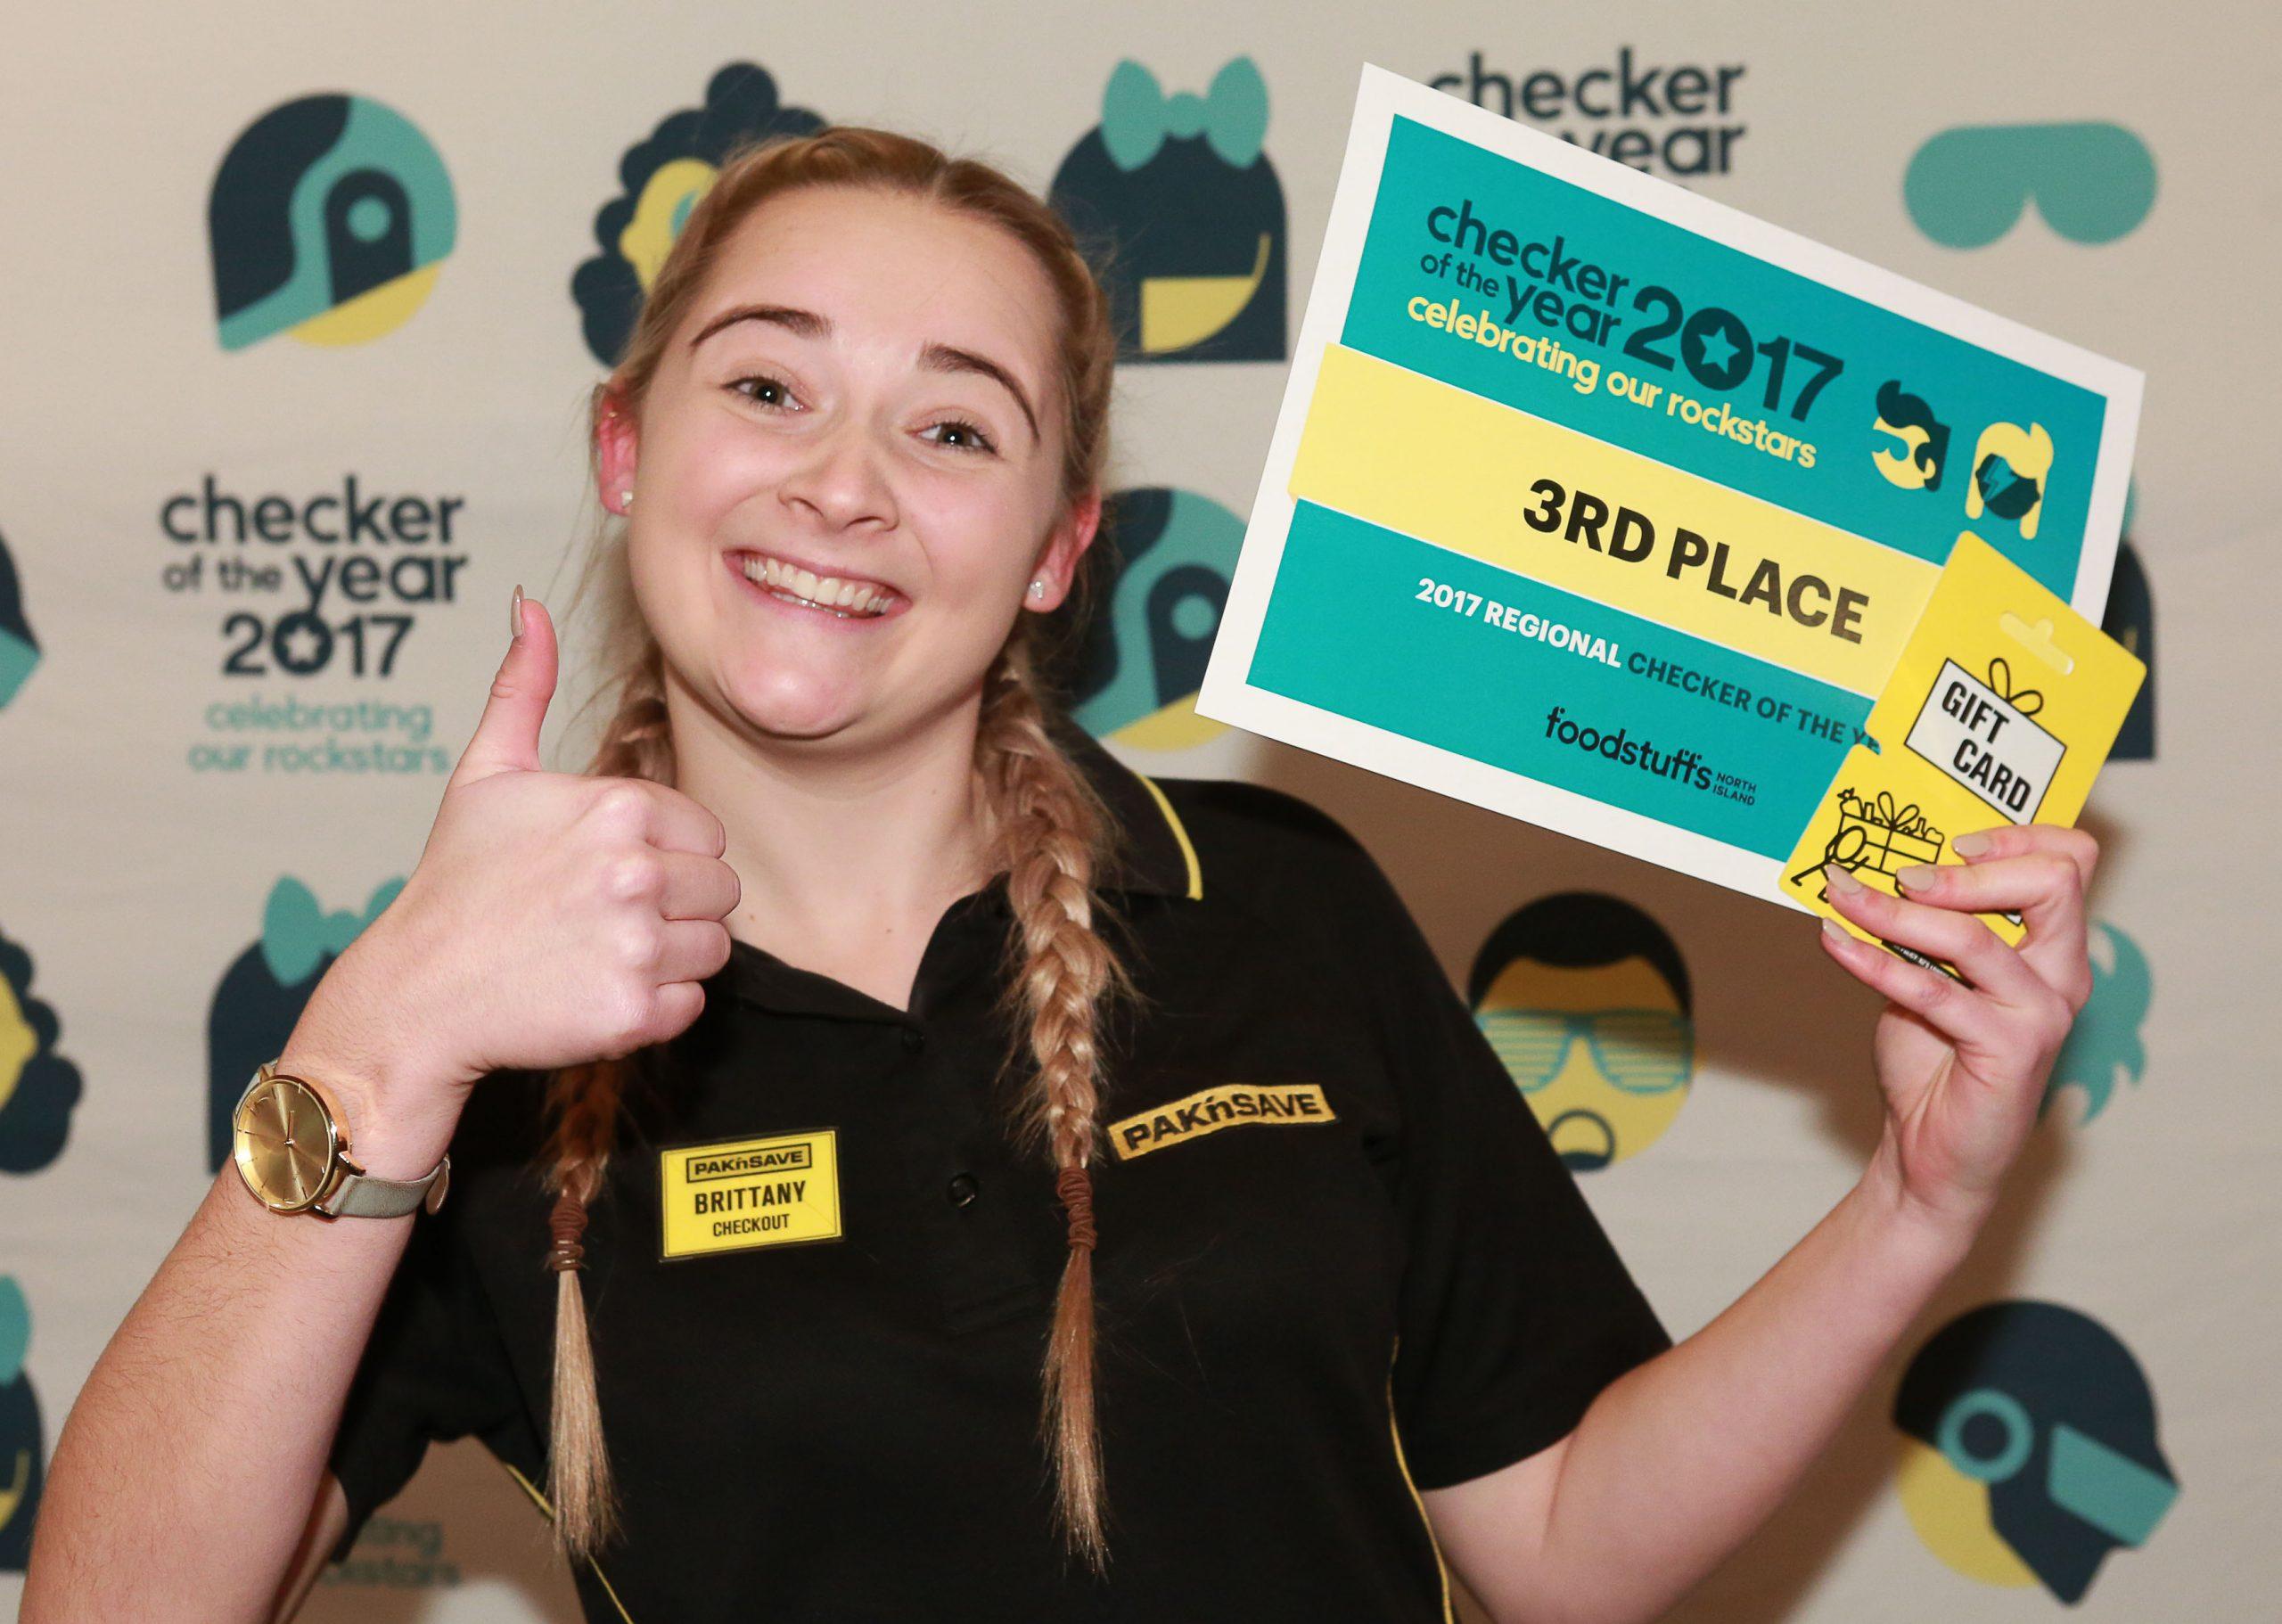 Third Place: Brittany Glavish.